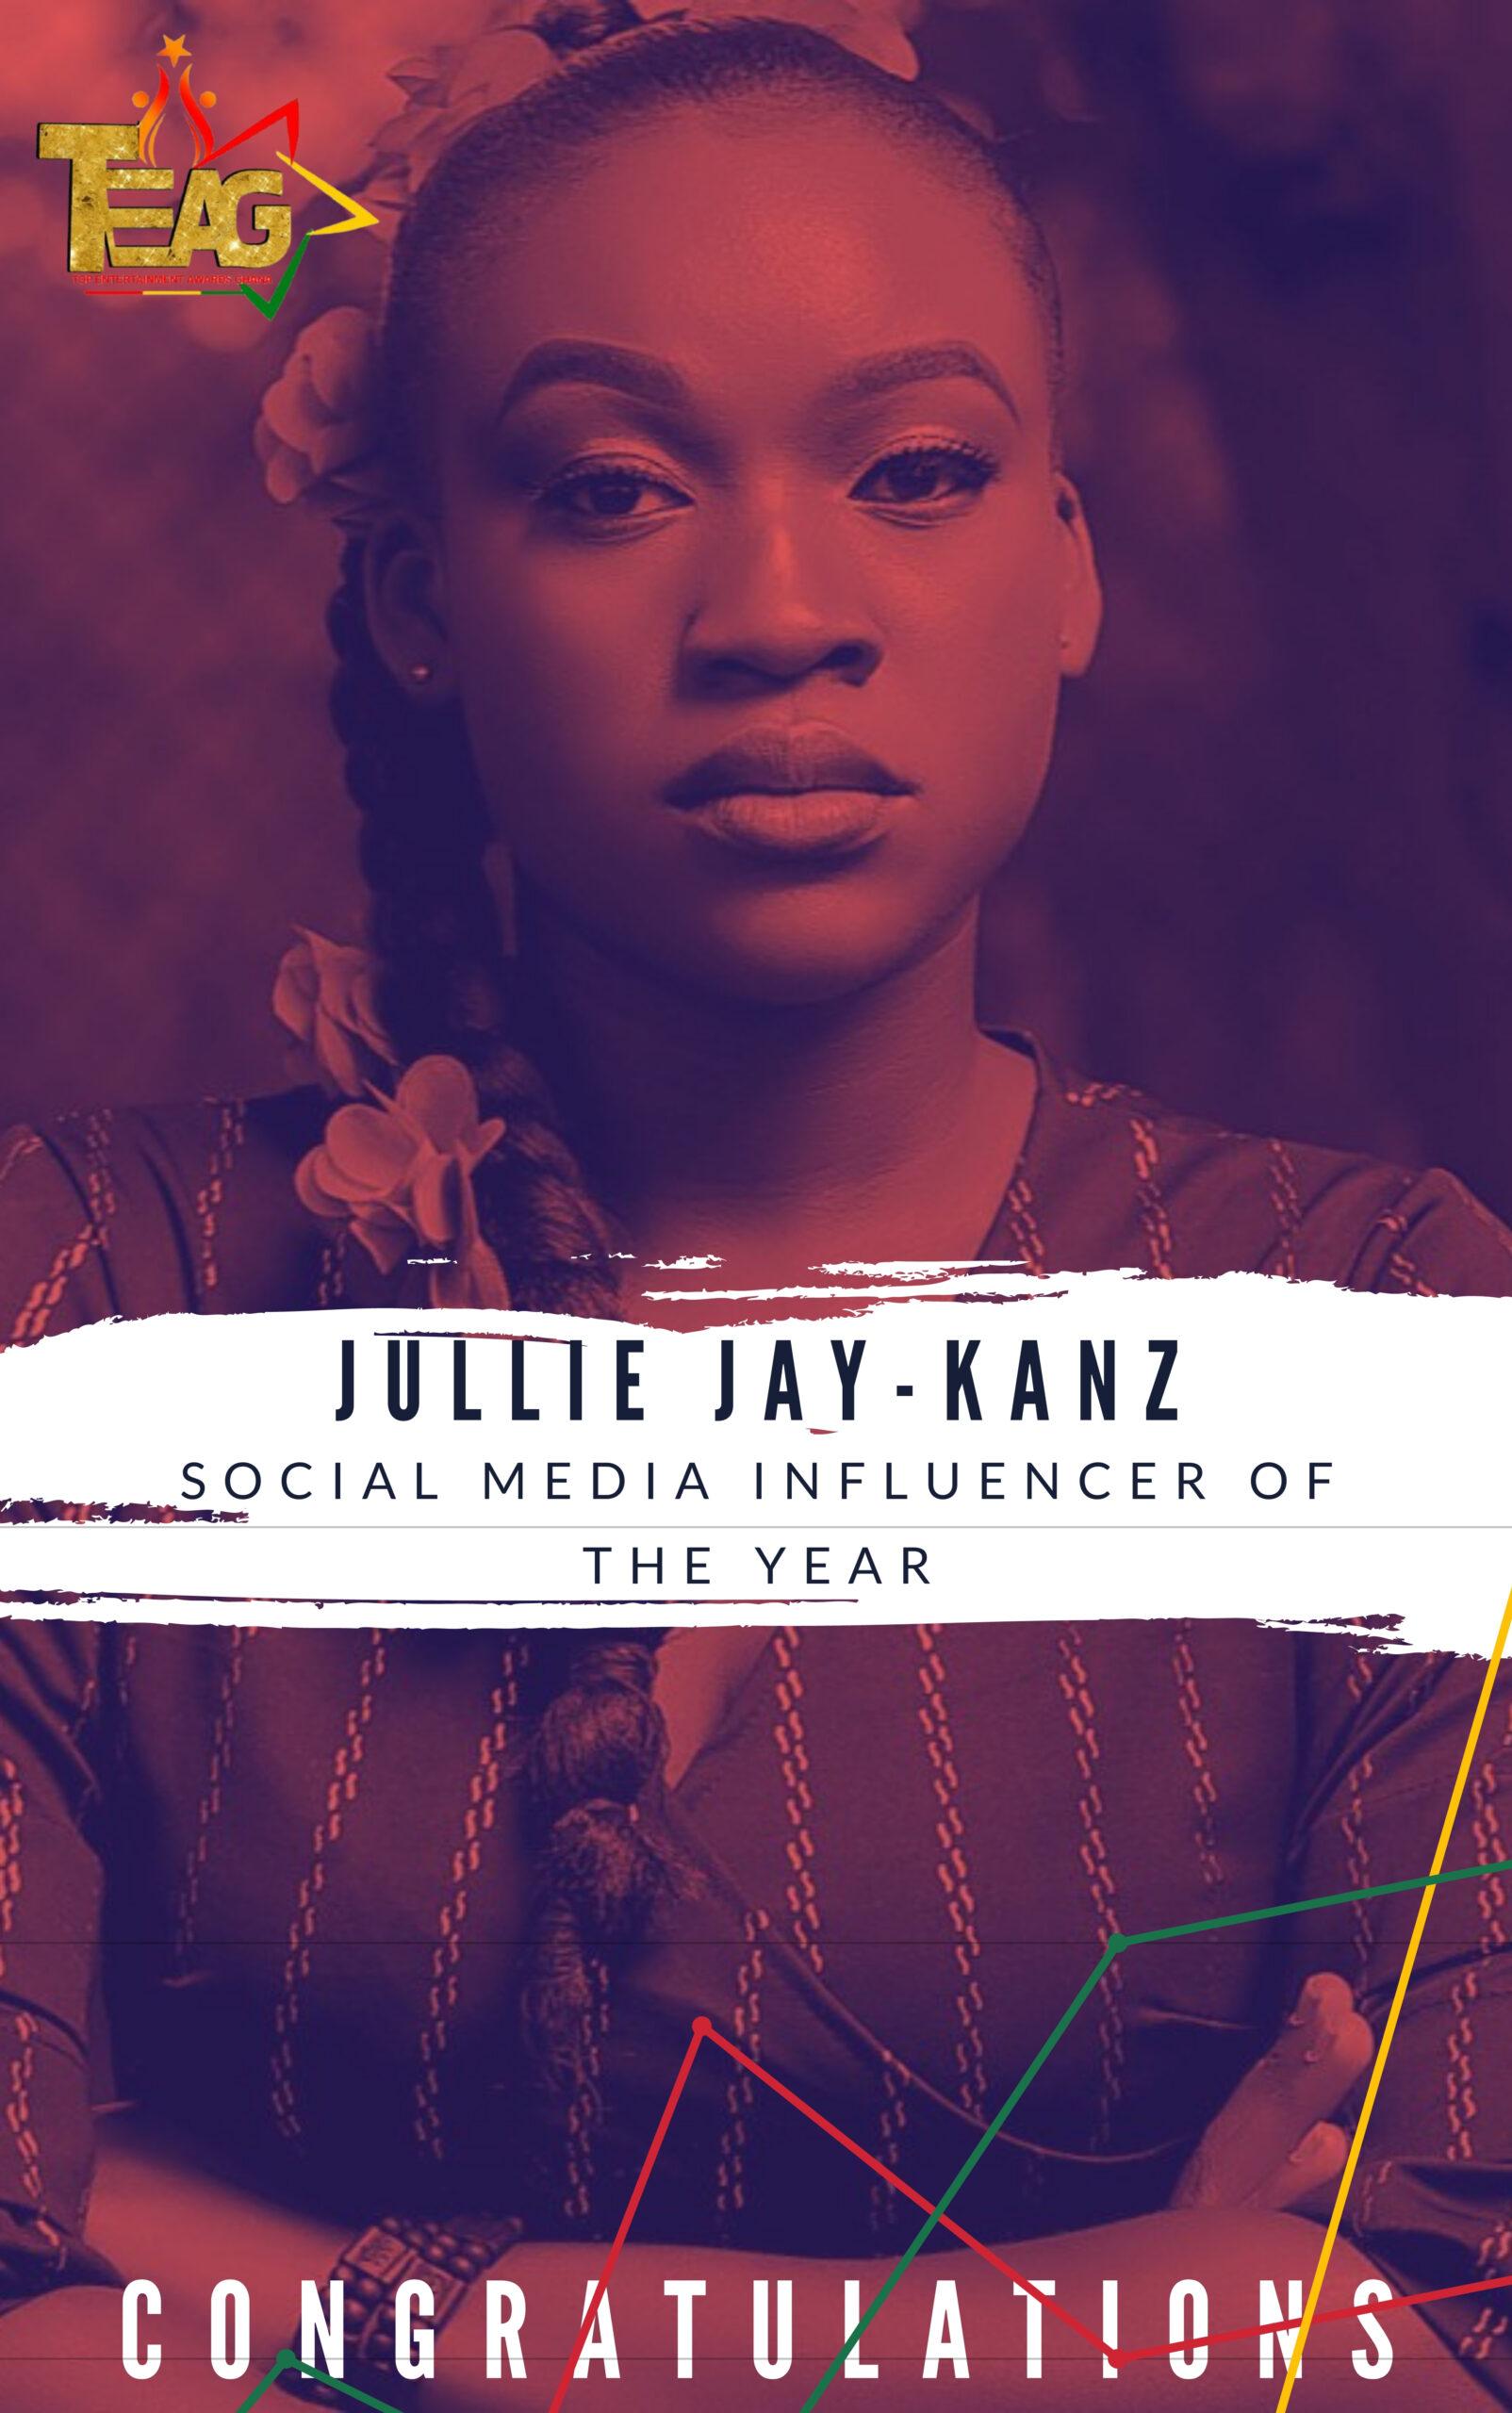 Jullie Jay-Kanz Wins Social Media Influencer of the year